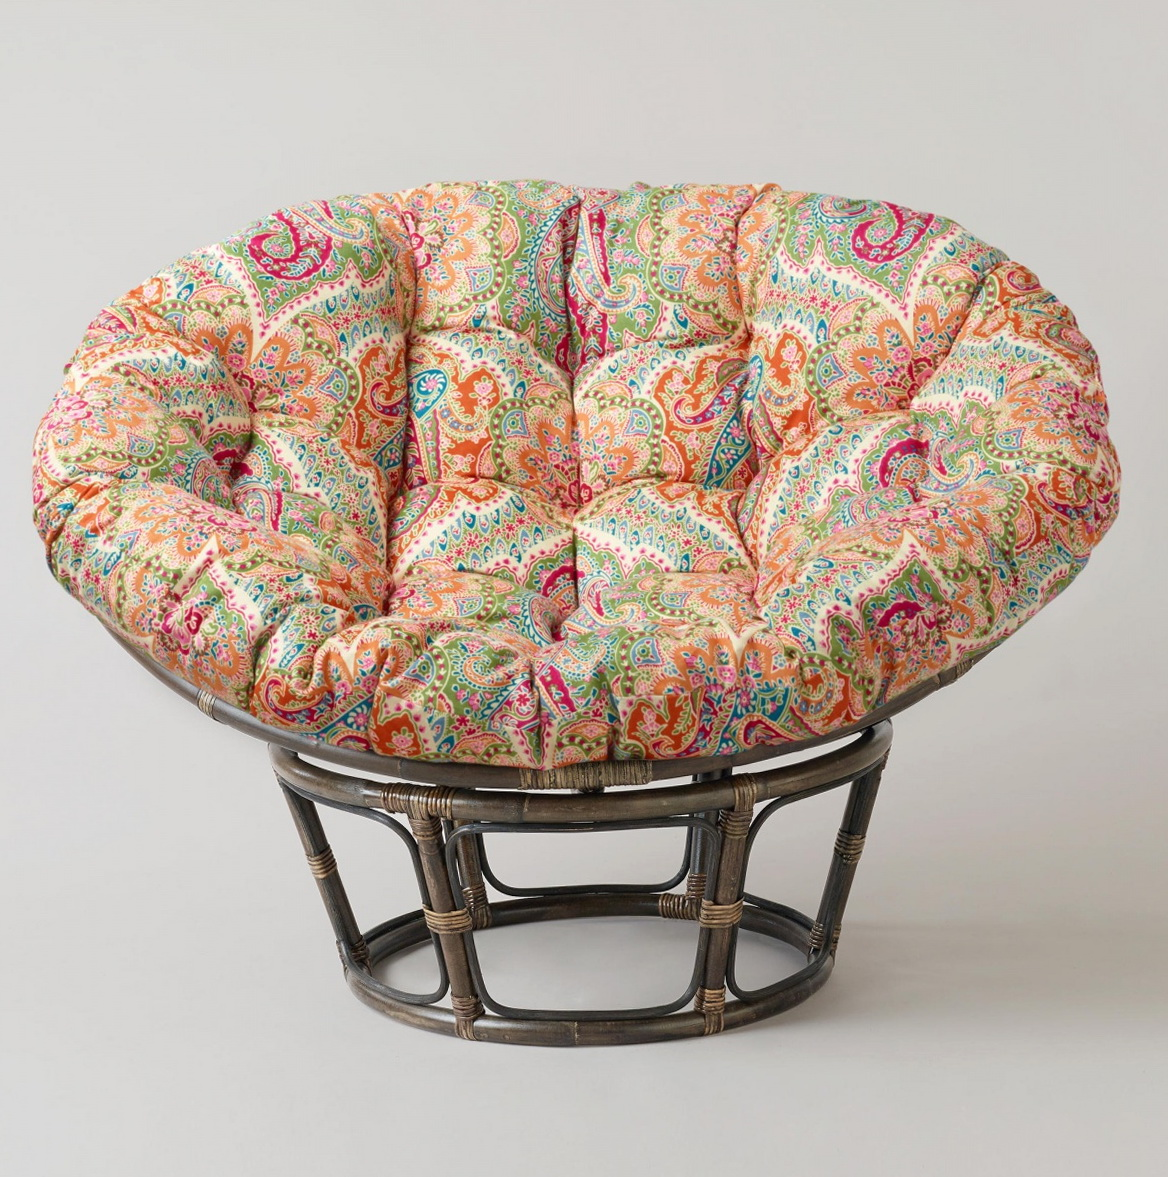 Superb Papasan Chair Cover Chair Design Ideas Yosepofficial Info Beatyapartments Chair Design Images Beatyapartmentscom